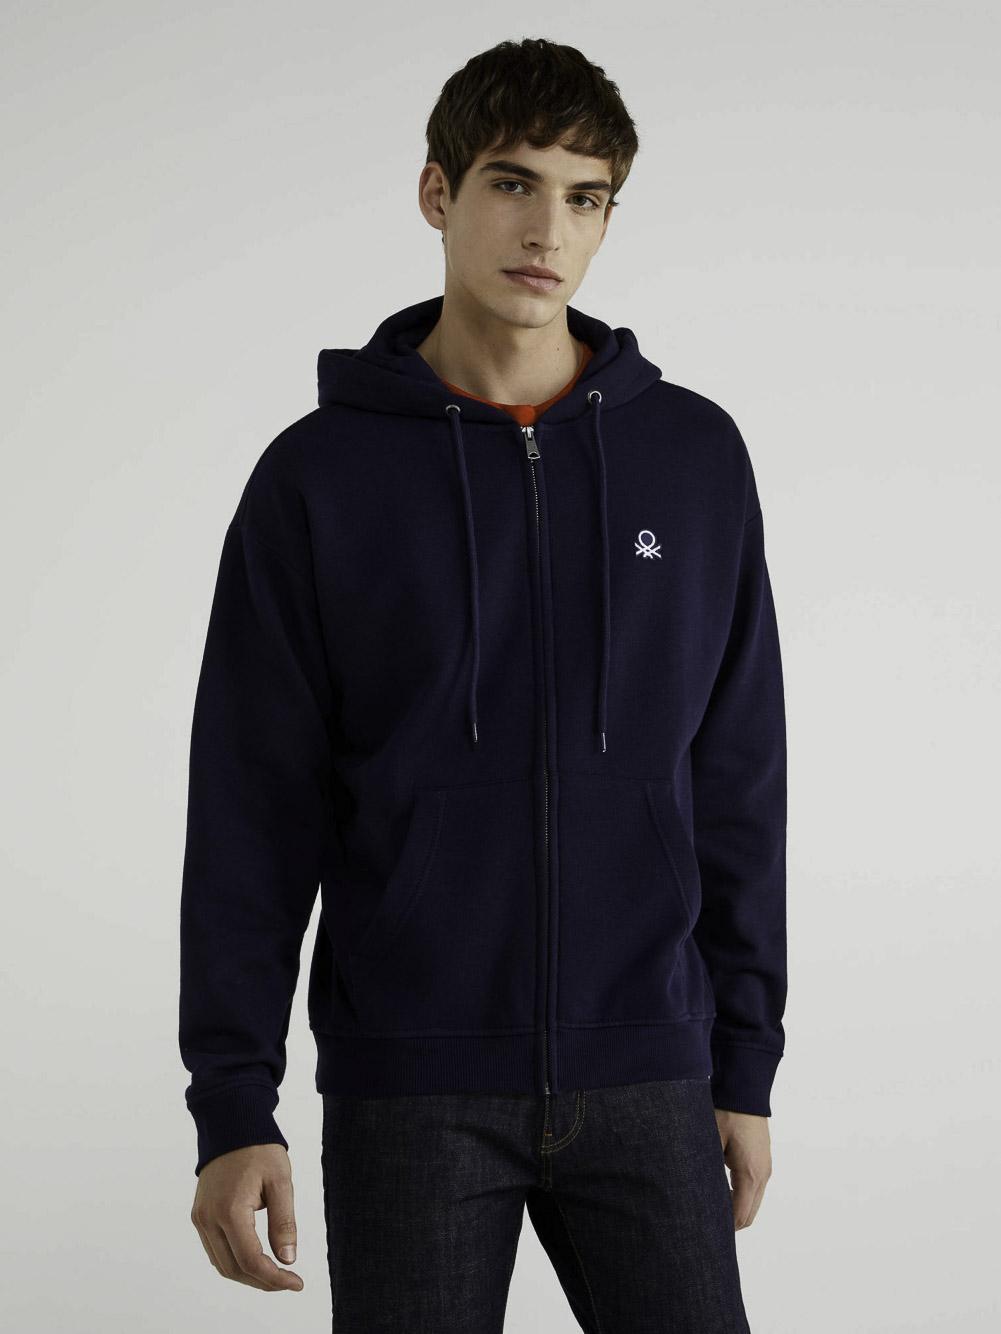 BENETTON Φούτερ με τσέπες και κουκούλα 3J73J5217 20A016